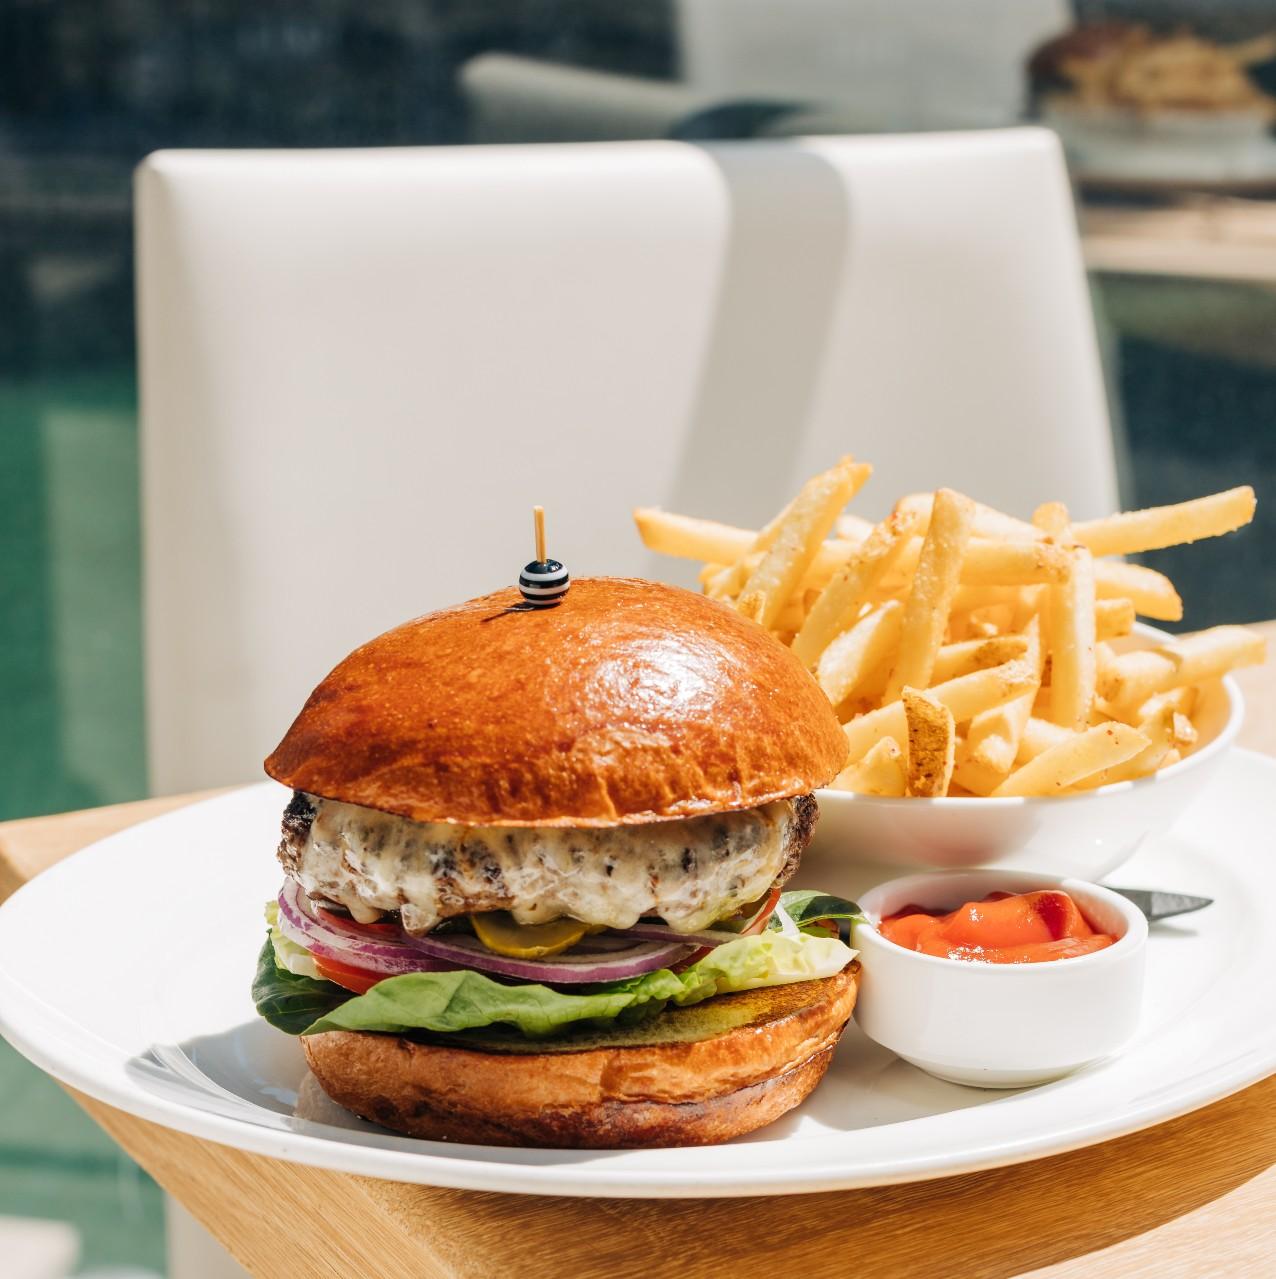 RPM SEafood Prime STeakburger